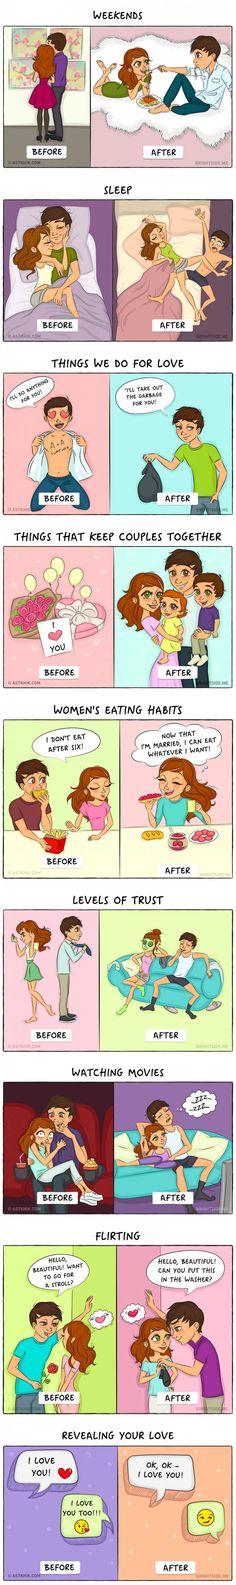 Dating Vs Marriage http://ibeebz.com